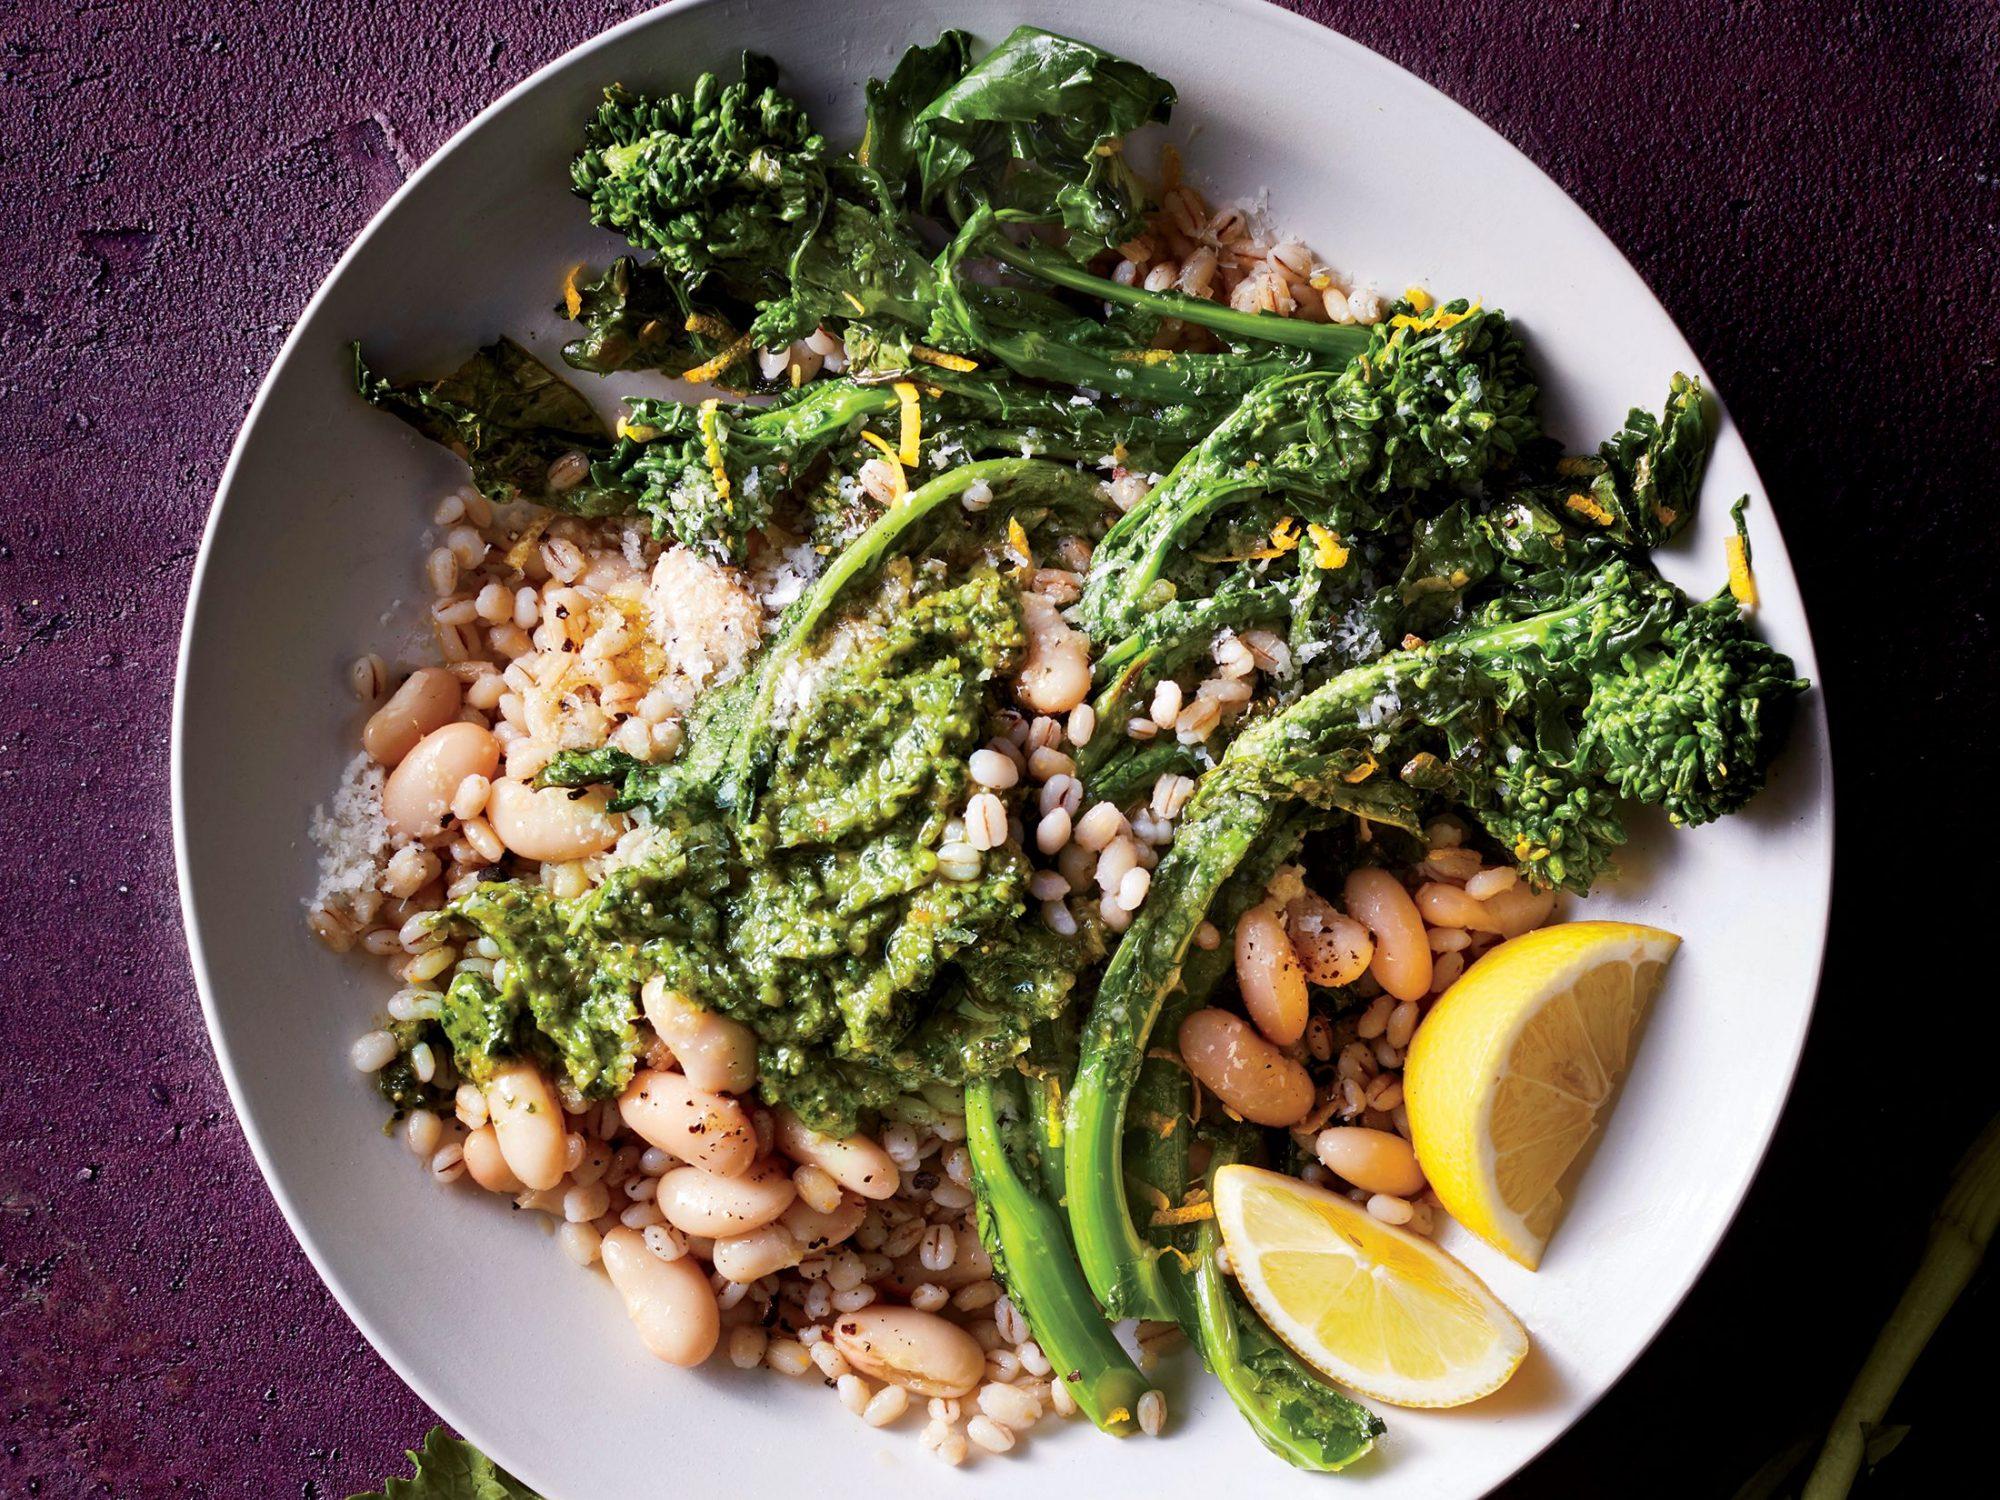 Broccoli Rabe and Barley Bowl with Cilantro Pesto